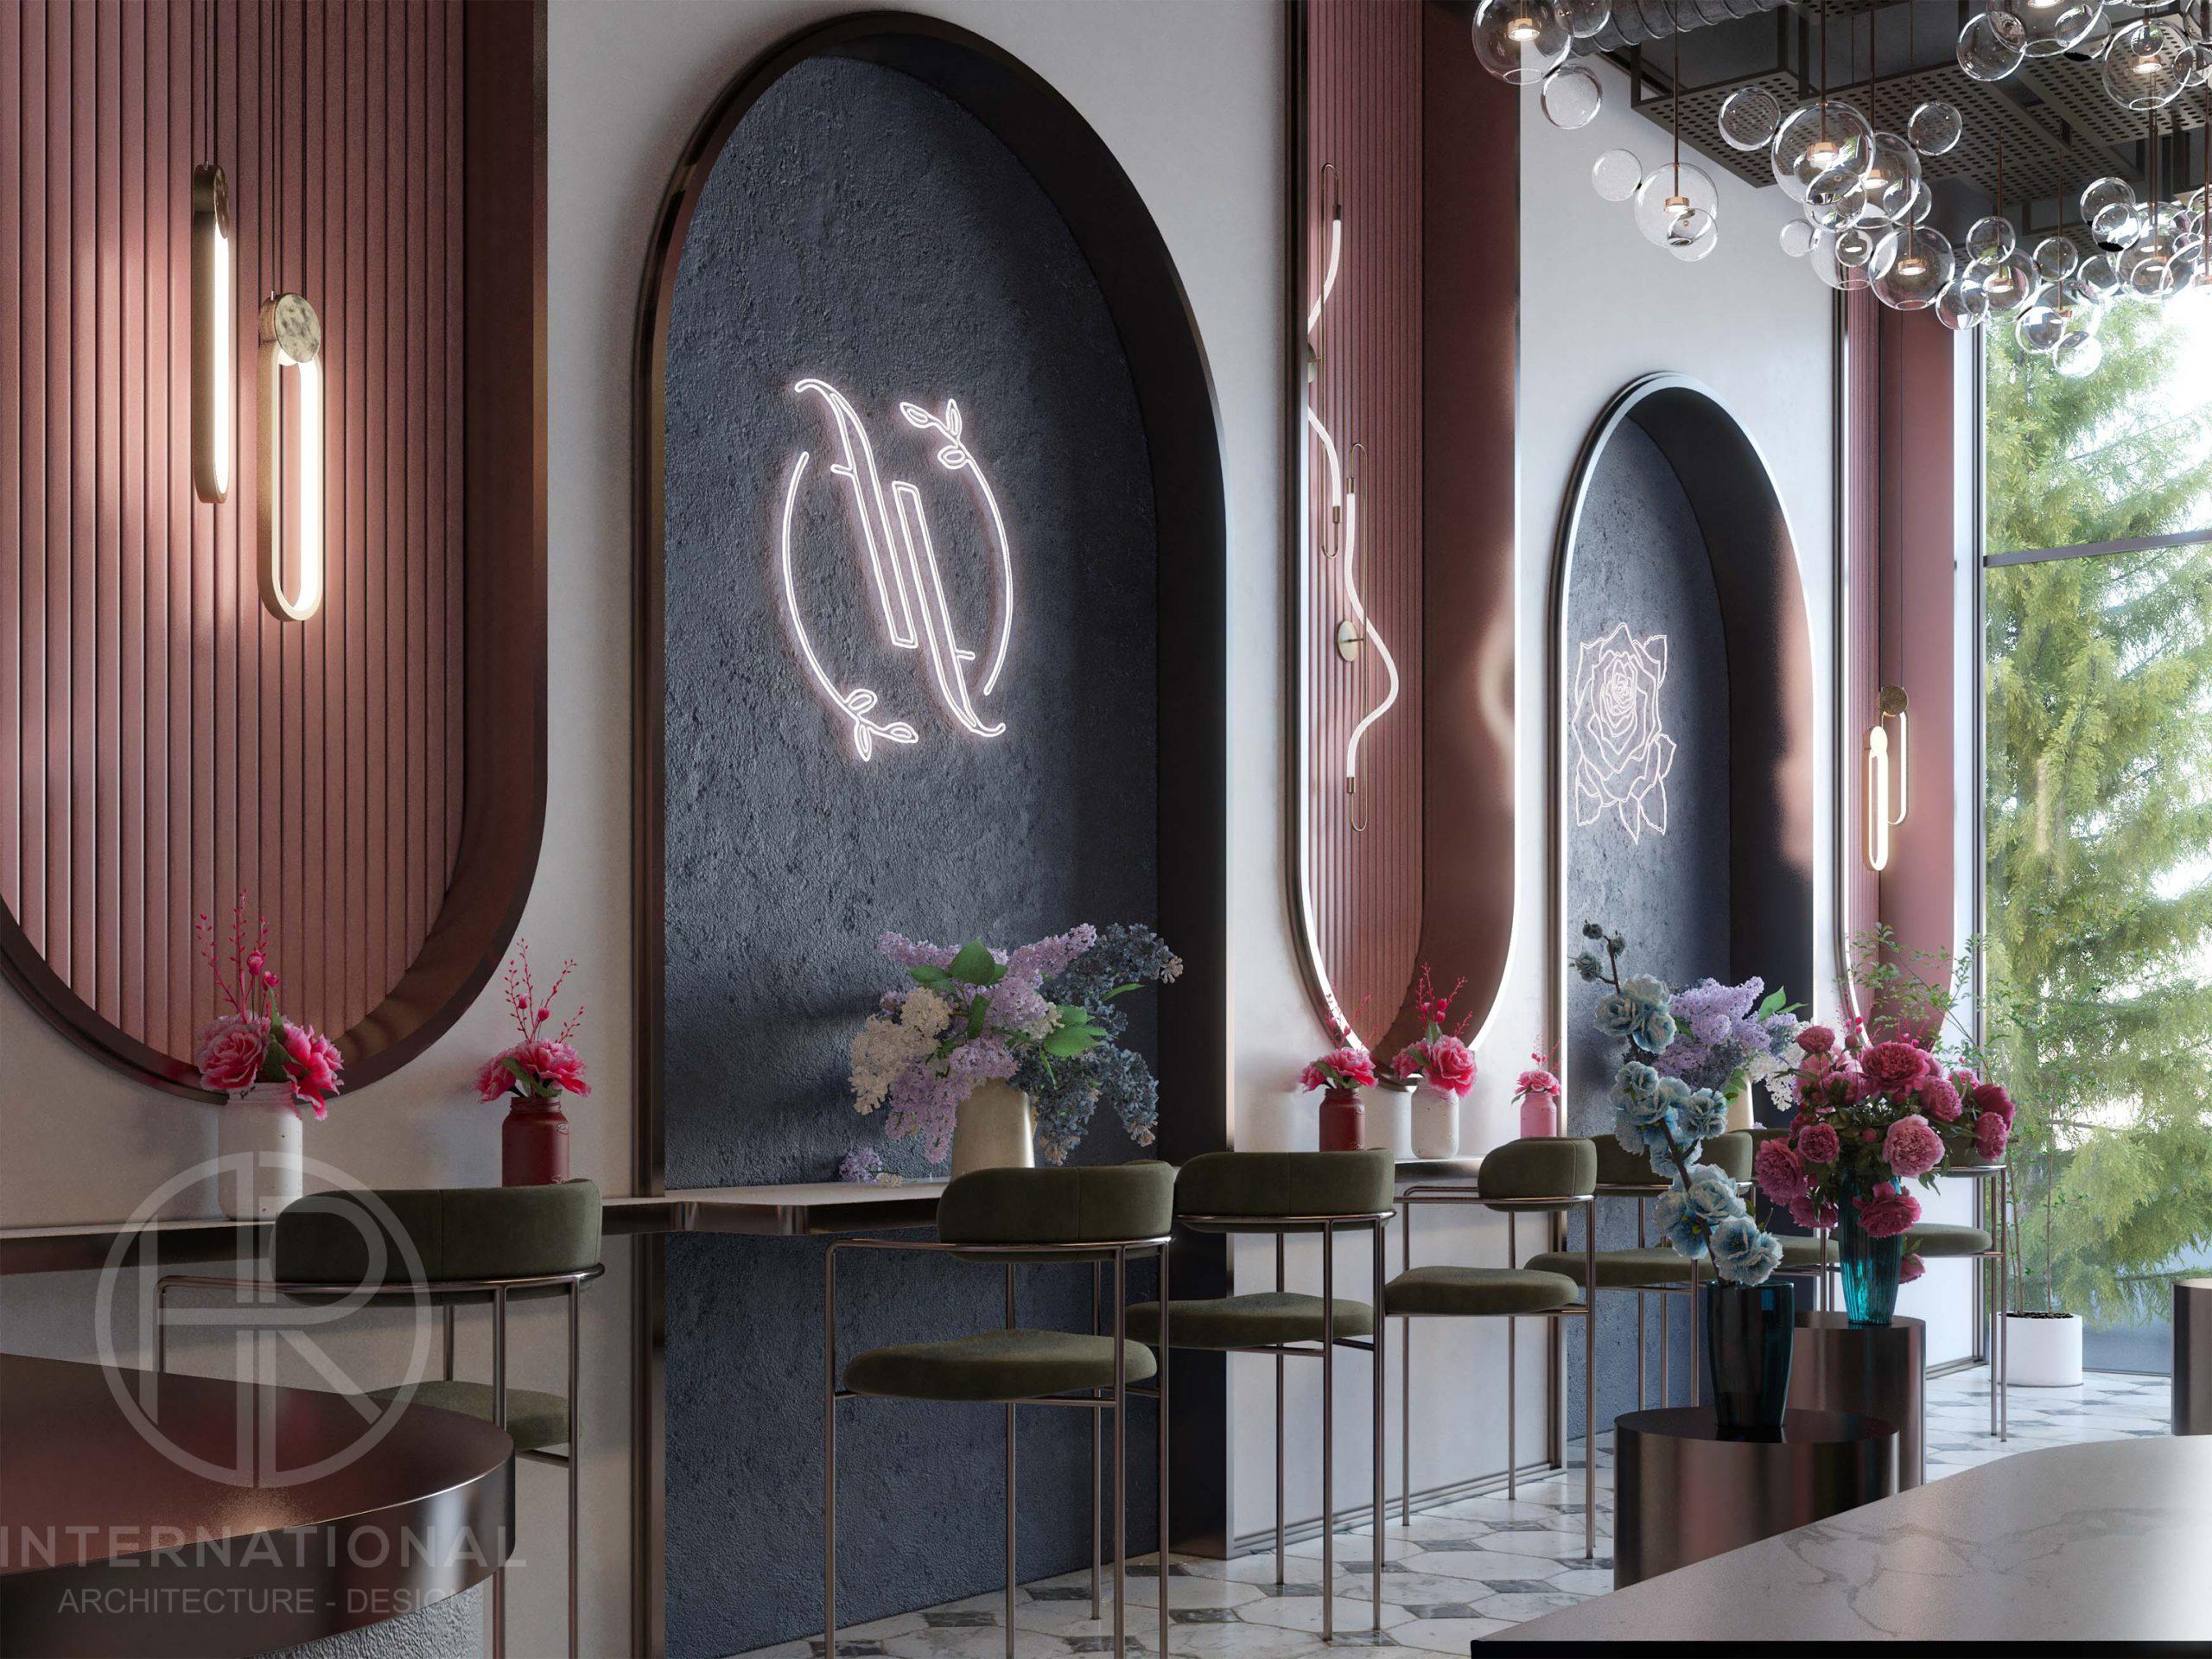 FLOUR & FLORET DESIGN - flowers - pink - blue - light work - bar